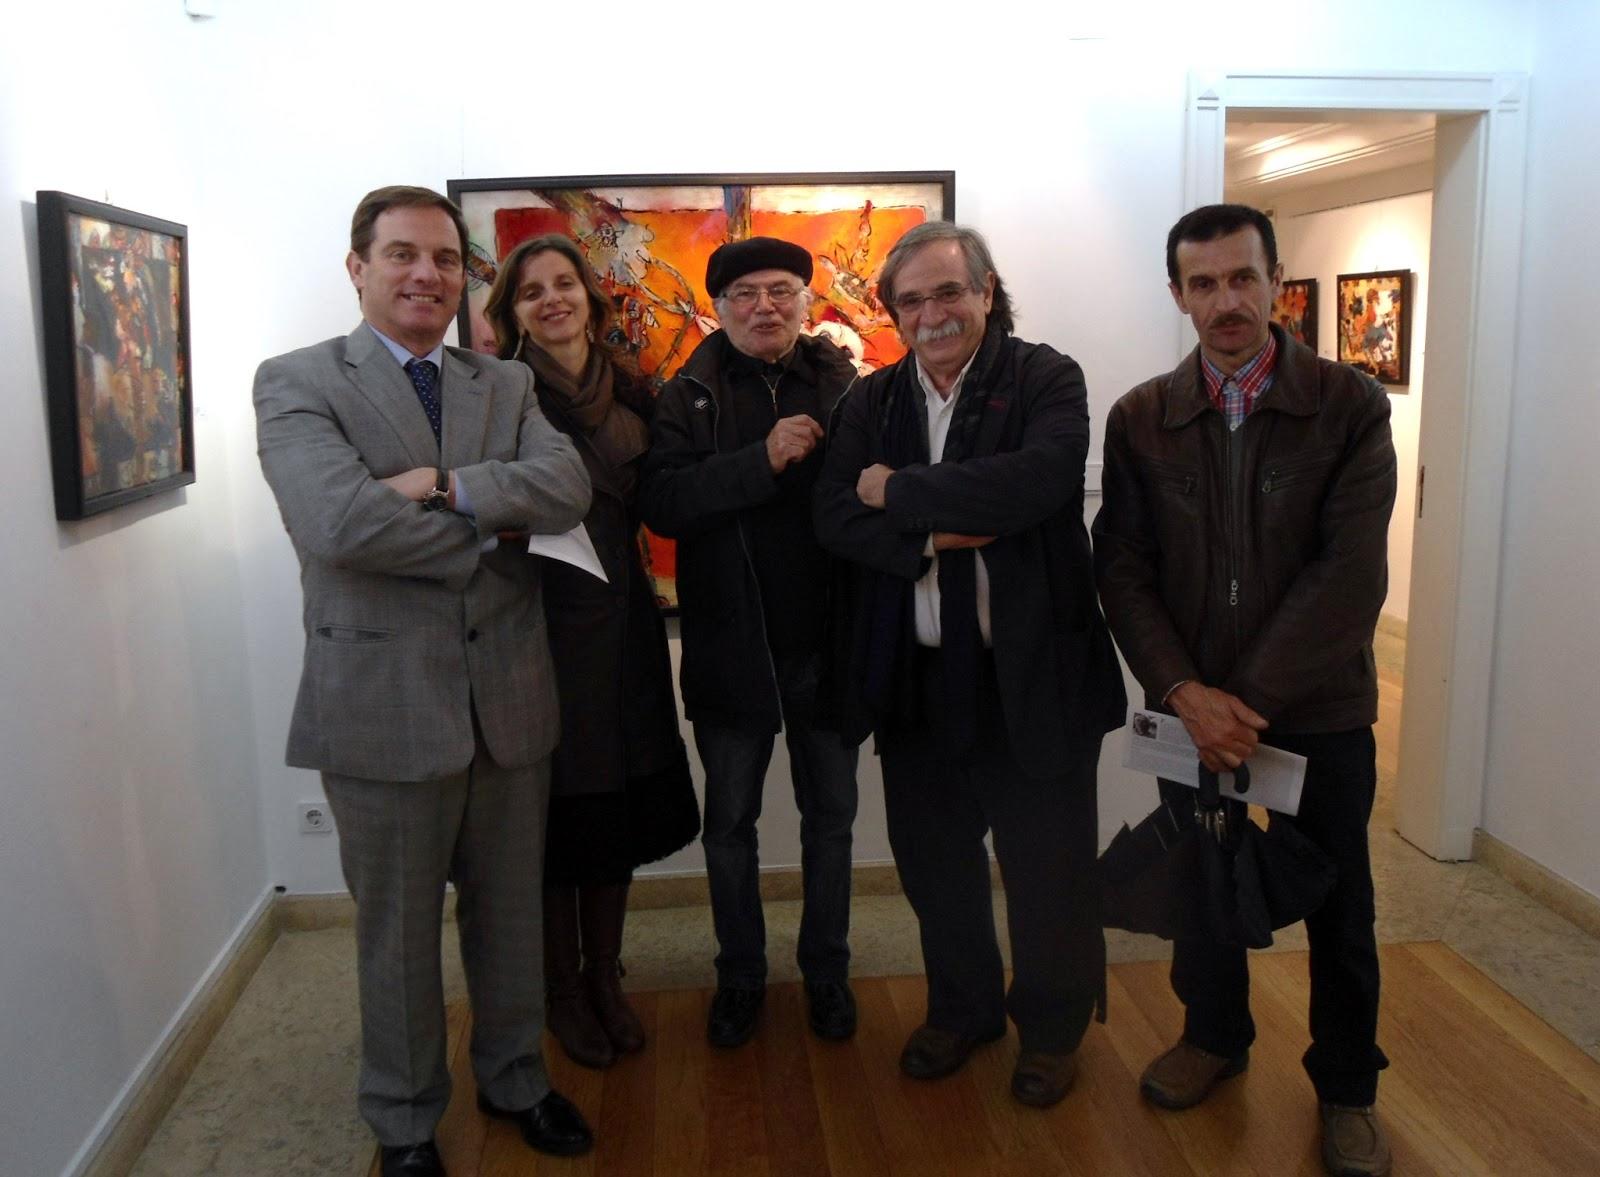 Alvaro Lobato de Faria, MAC,  at the opening of  Fernando d`F. Pereira's exhibition